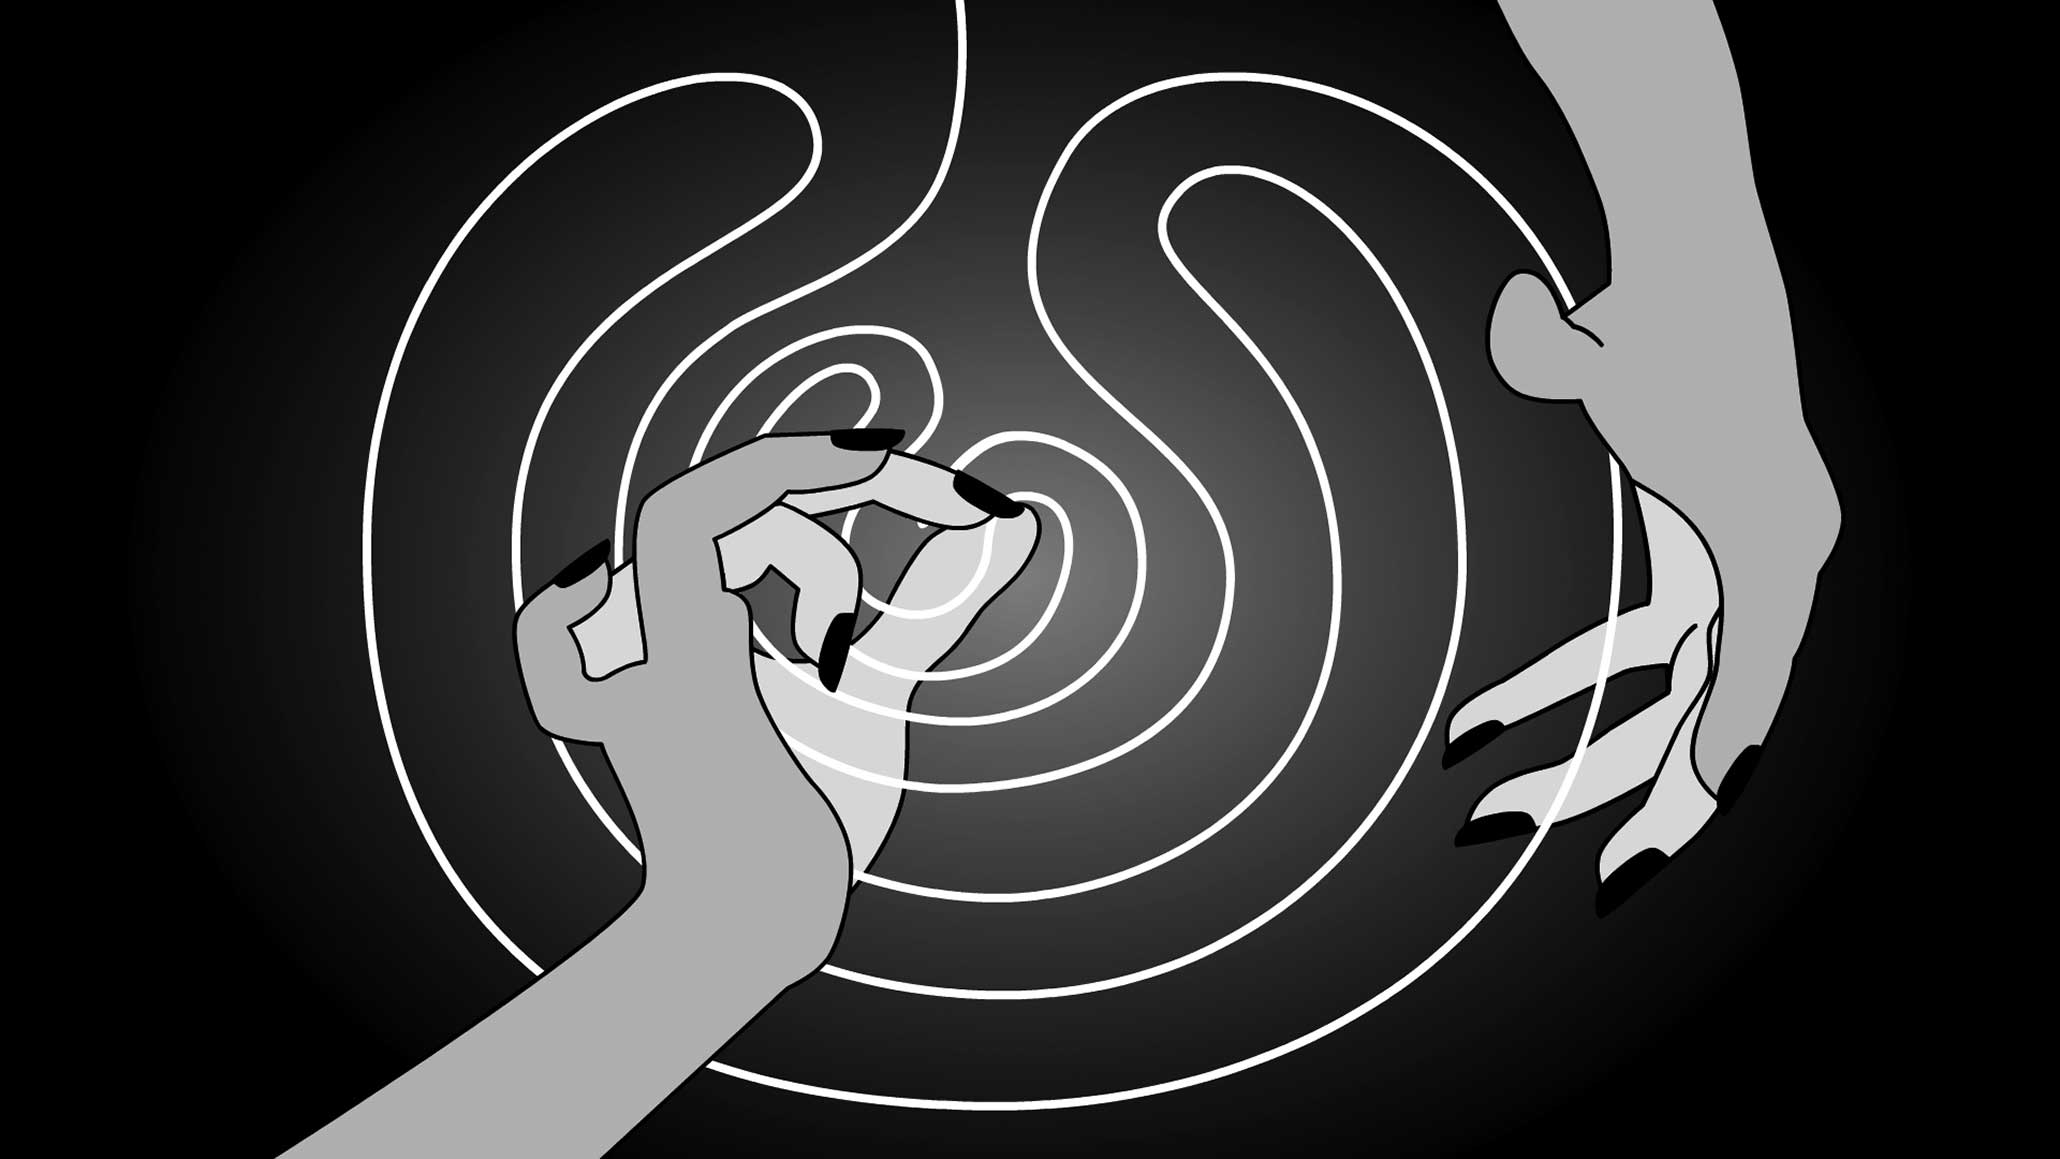 Global Vulva (2009), Flash animation / HD video, b/w, stereo, 6:20, loop. Director, script, graphics, animation: Myriam Thyes. Music: Kristina Kanders. Video still.